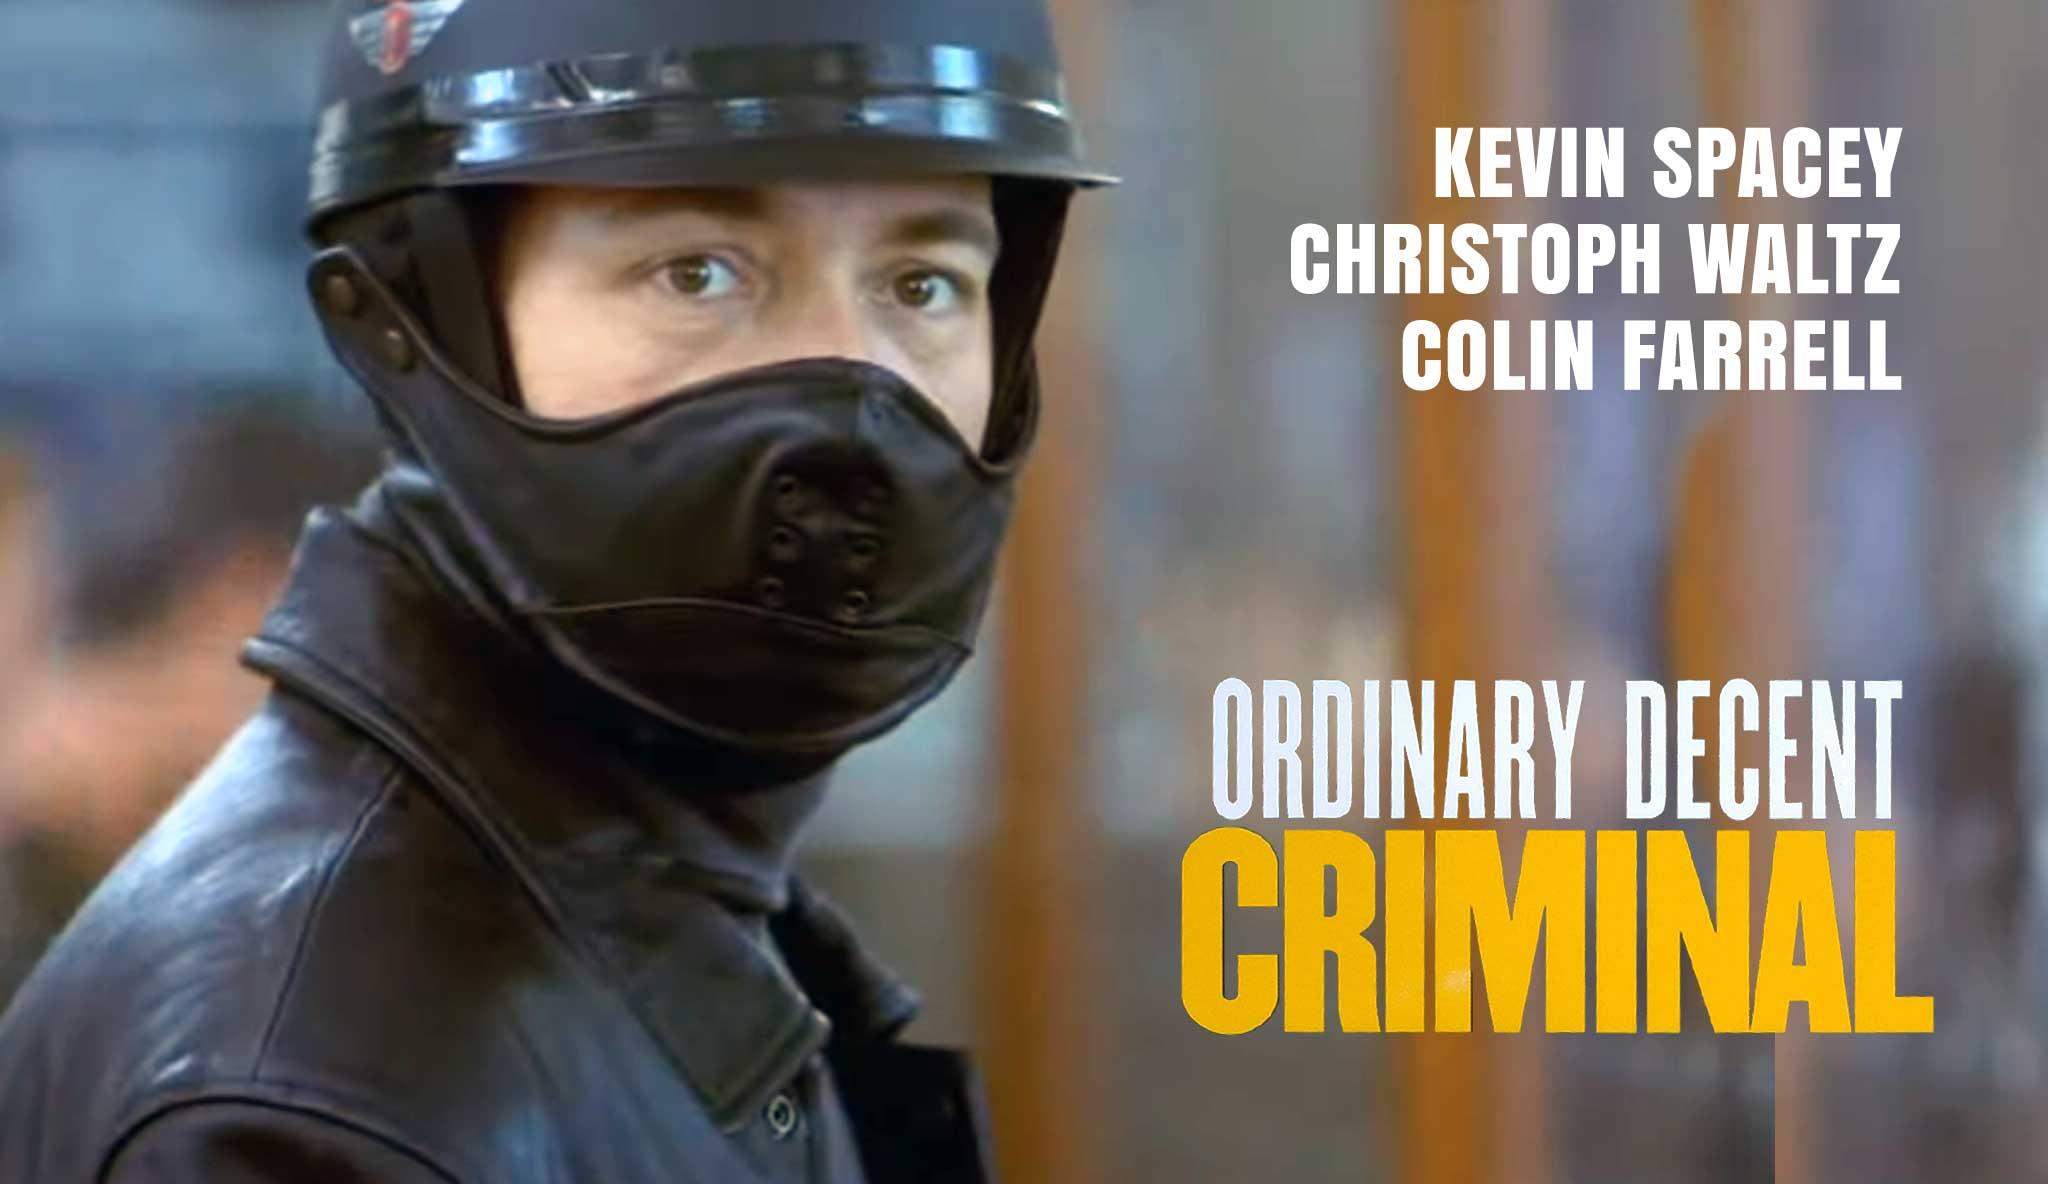 ordinary-decent-criminal\header.jpg